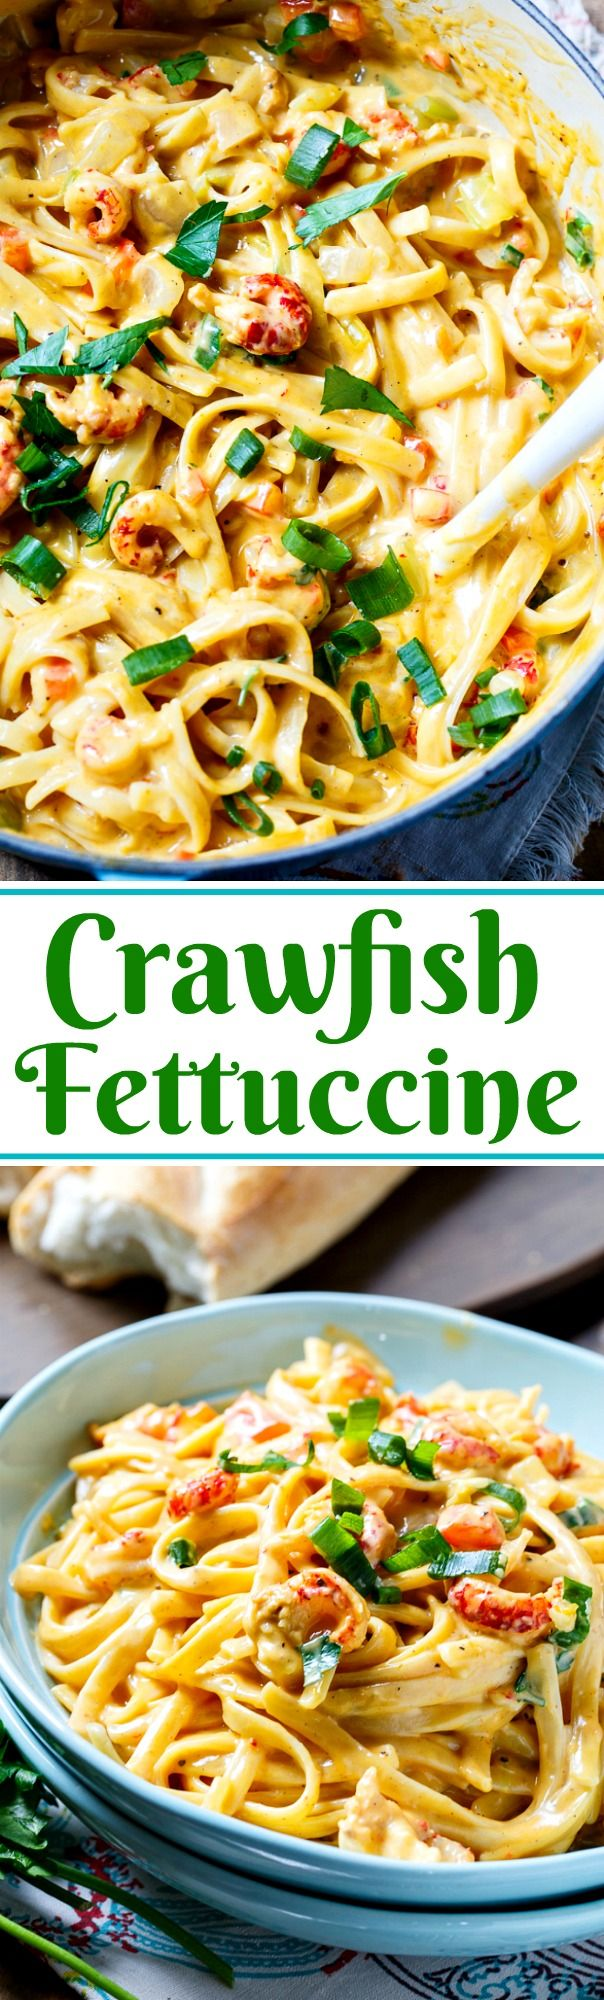 Creamy and cheesy Crawfish Fettuccine- perfect for Mardi Gras!